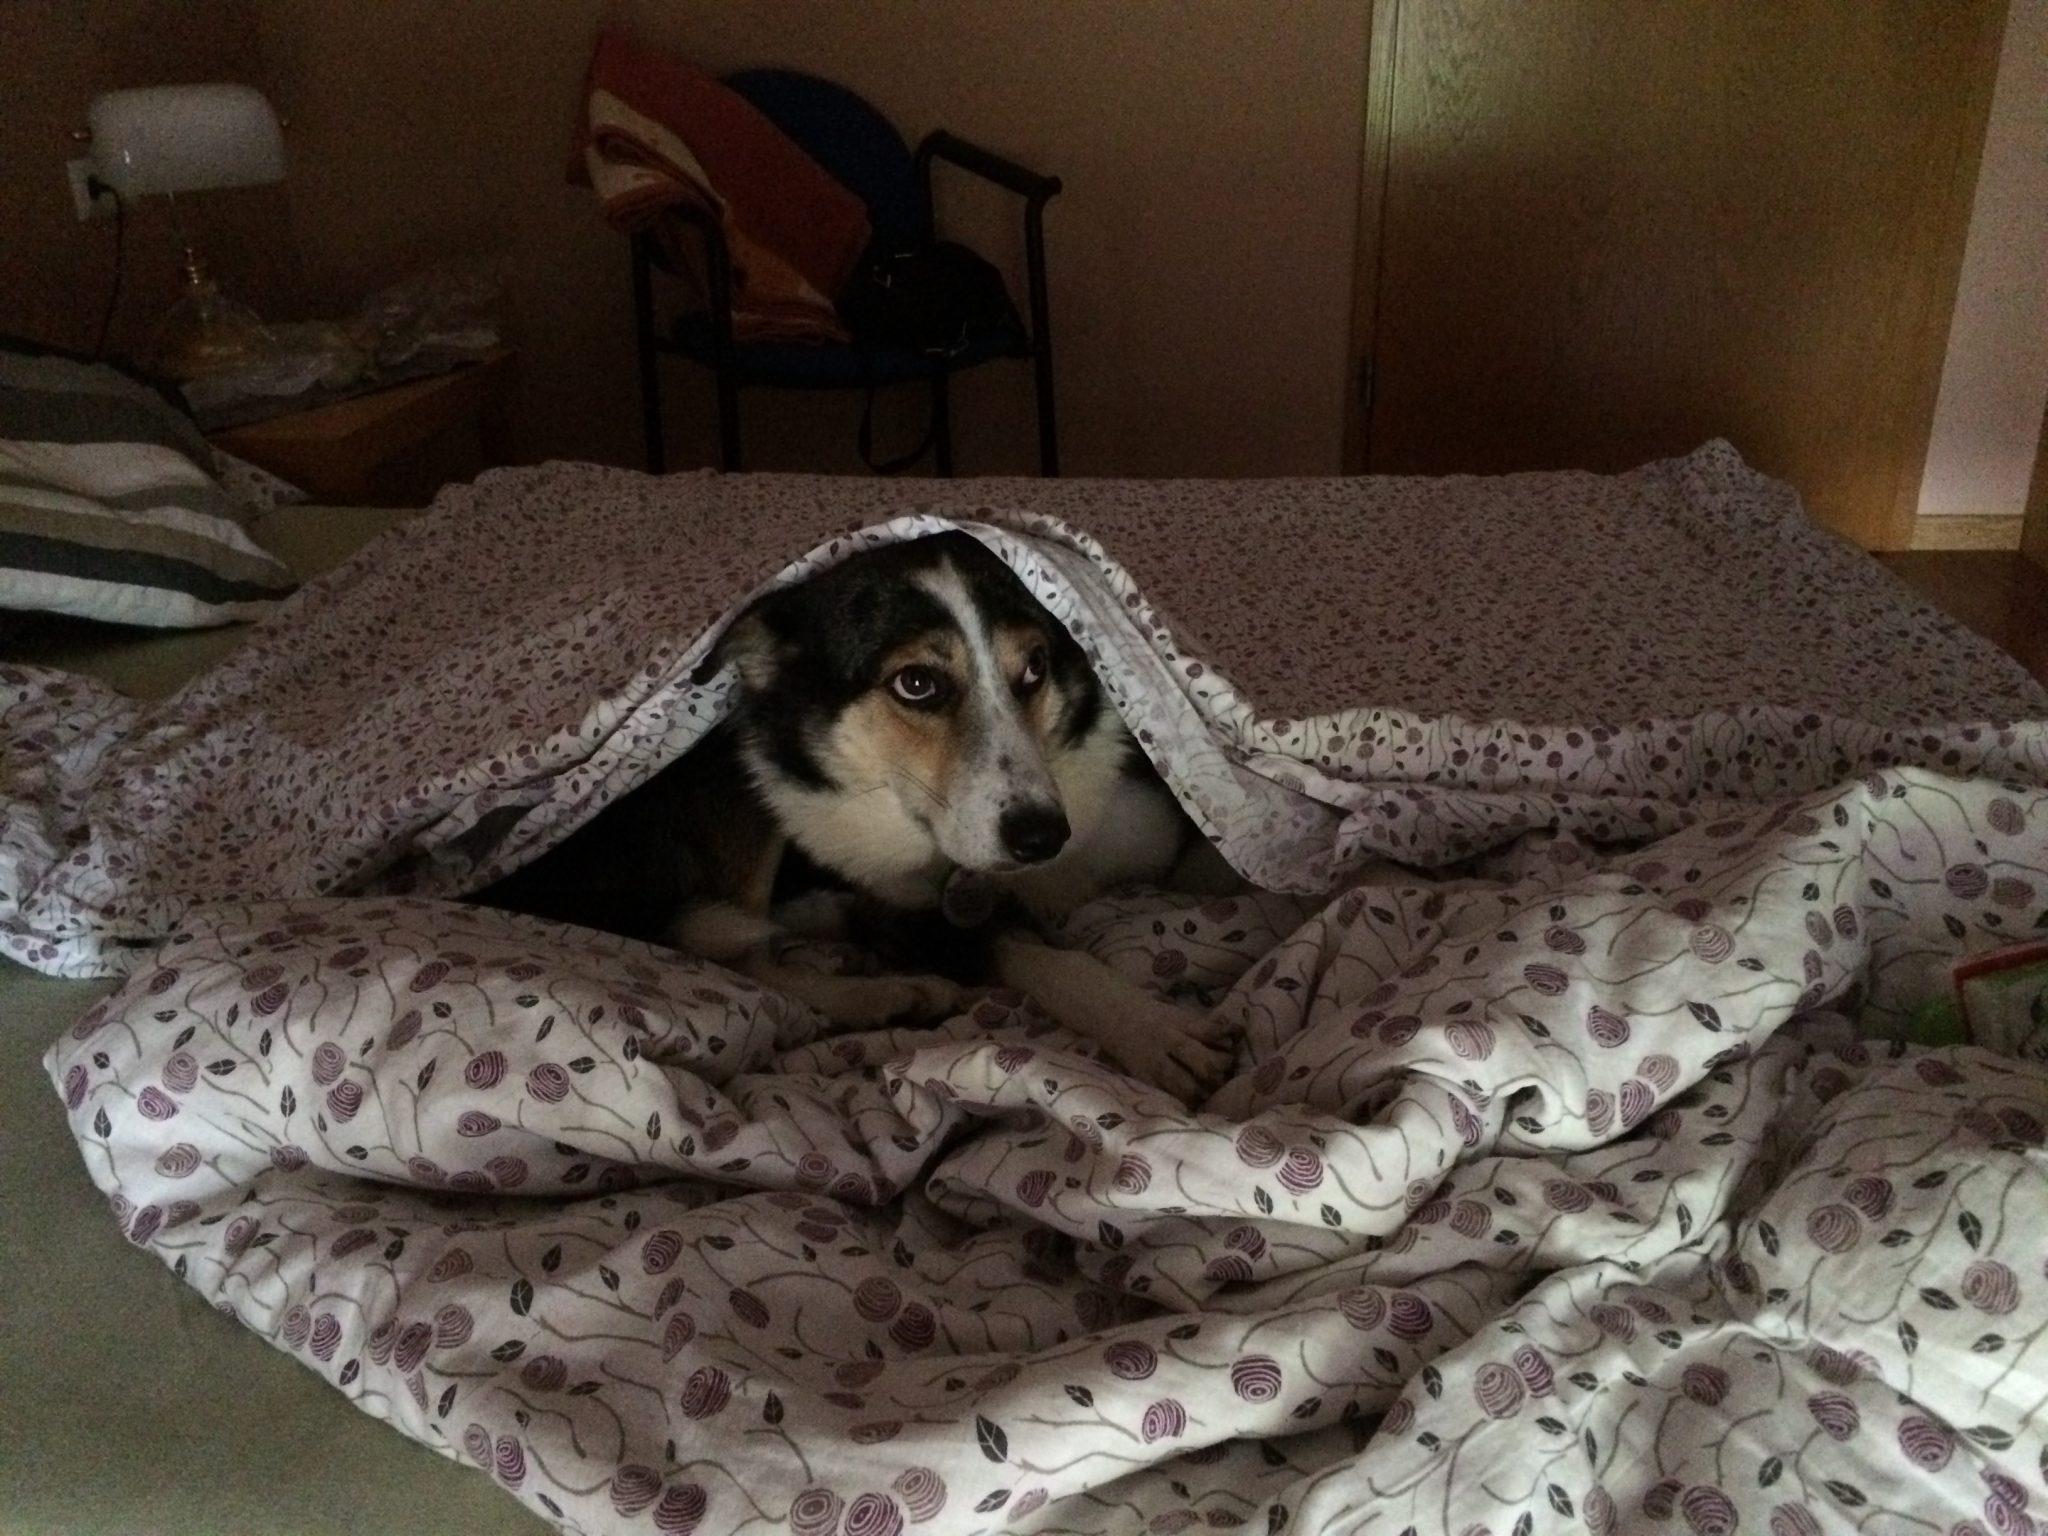 Hund im Bett unter Bettdecke